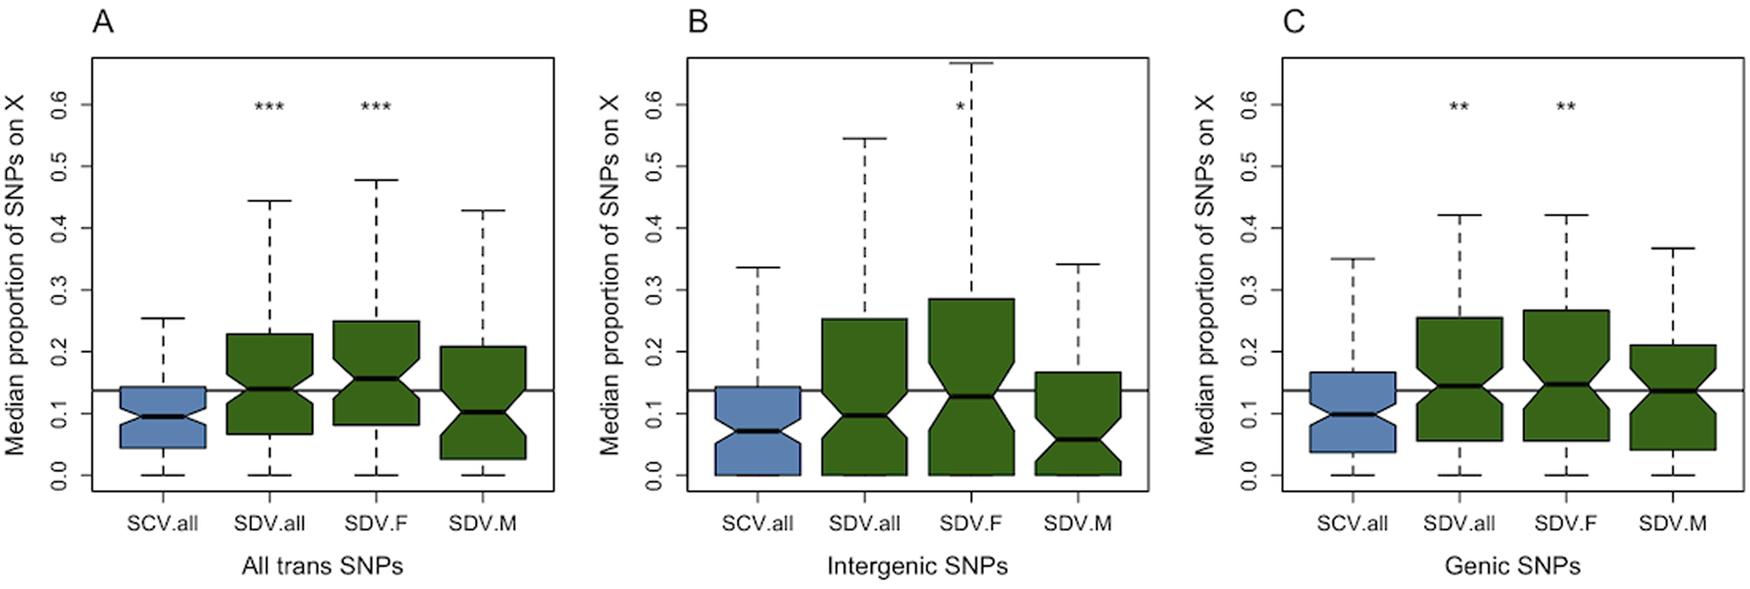 Genomic distribution of <i>trans</i>-acting SNPs.